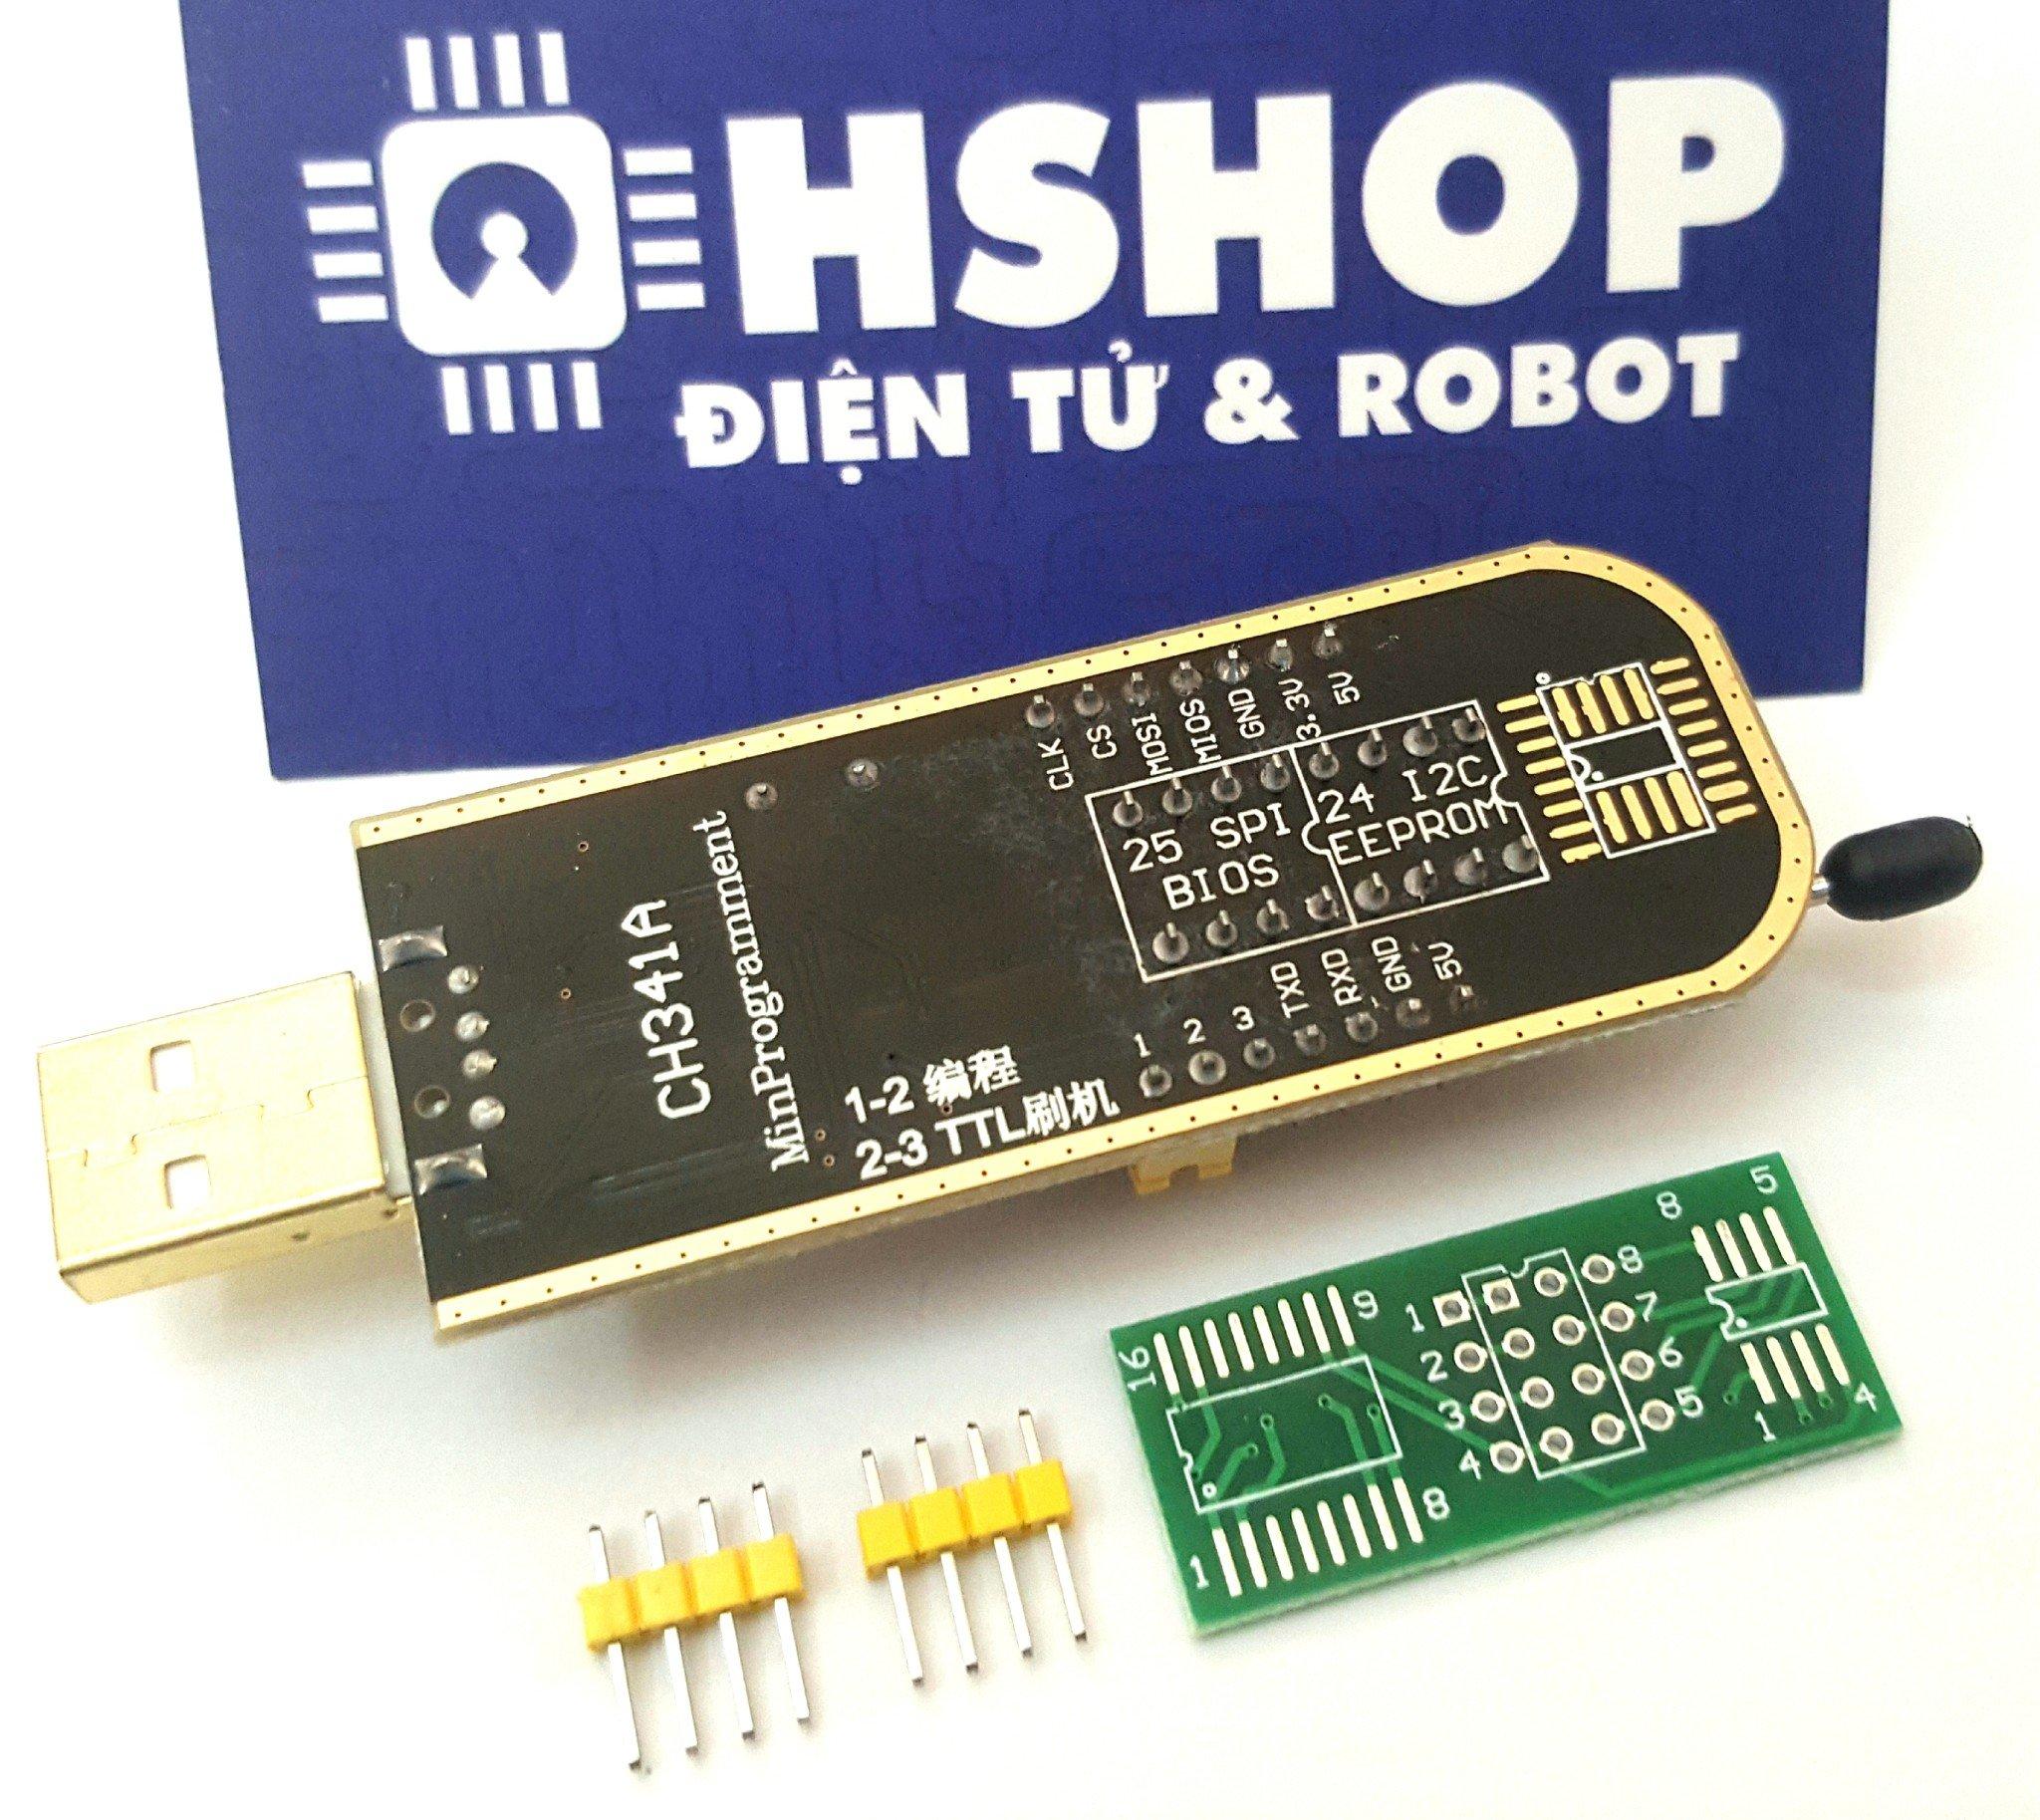 Mạch nạp EEPROM Flash SPI CH341A Programmer – Hshop vn